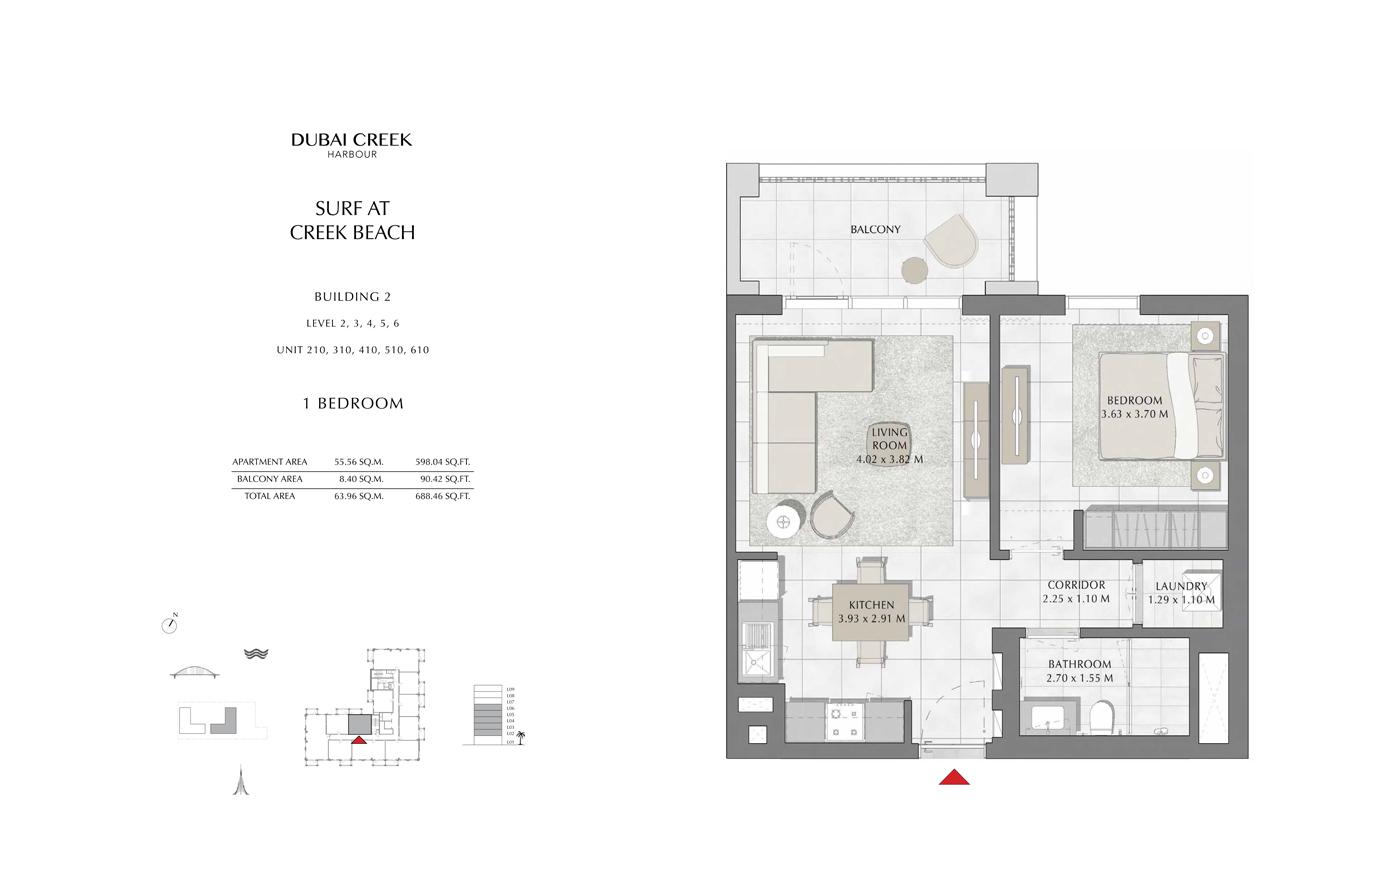 Building 2, 1 Bedroom Level 2, 3, 4, 5, 6 Size 688 Sq Ft